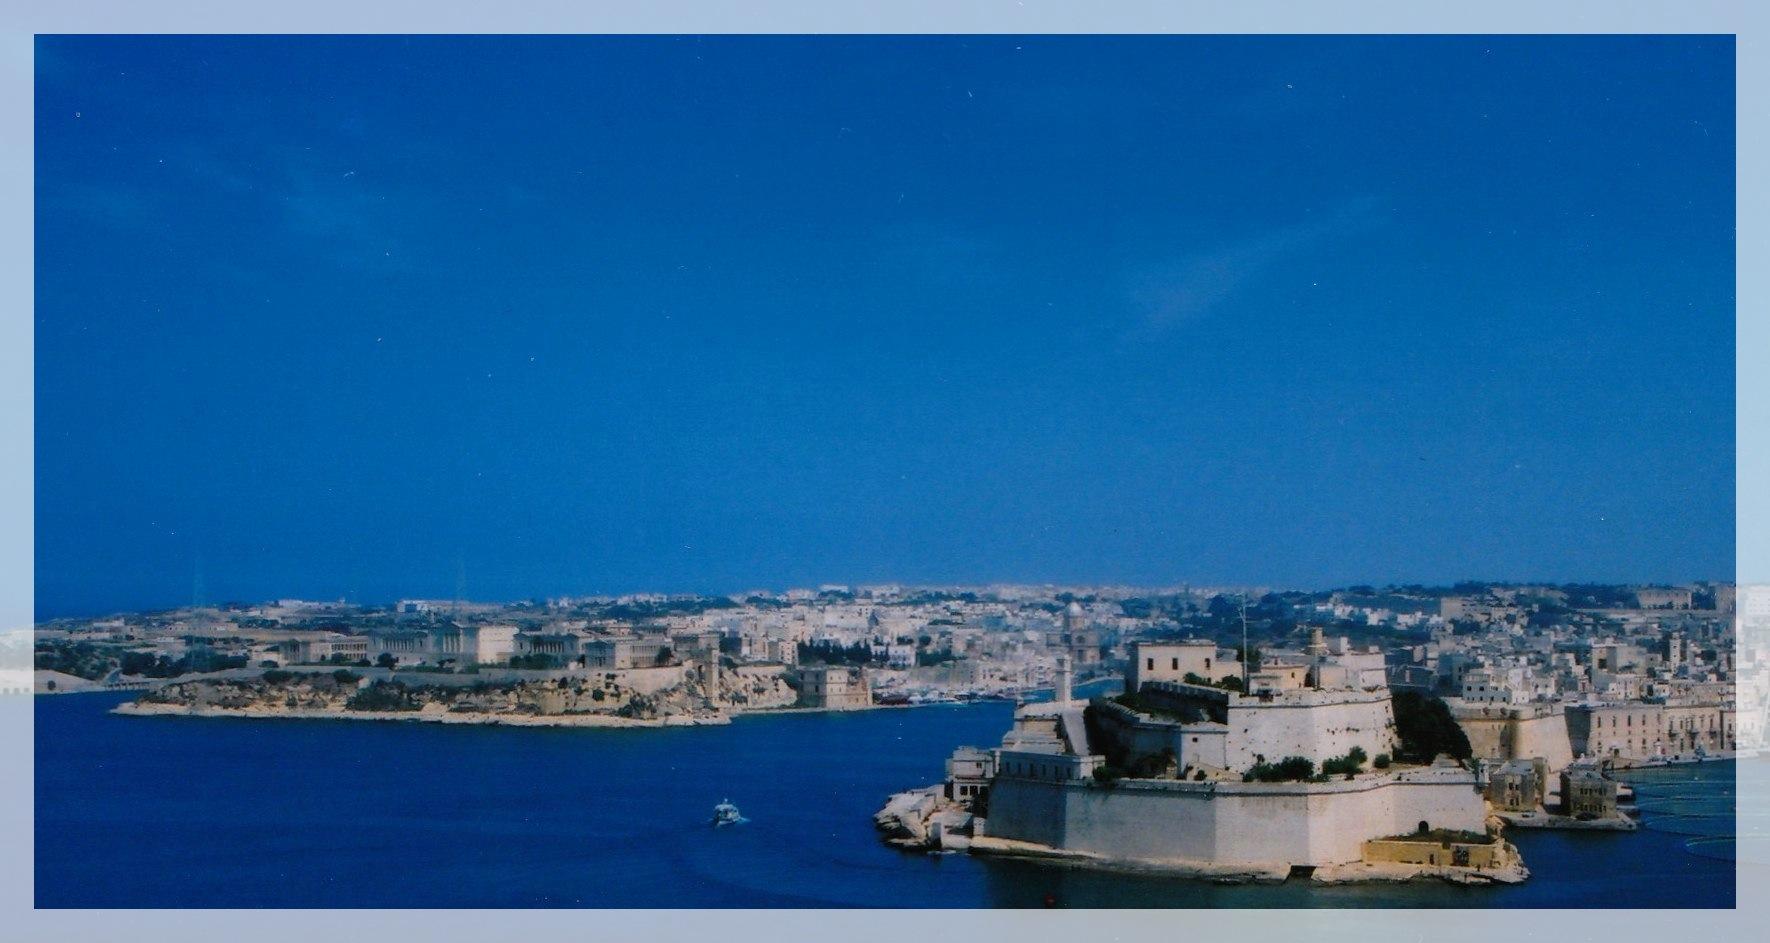 世界一周旅行 マルタ旅行記